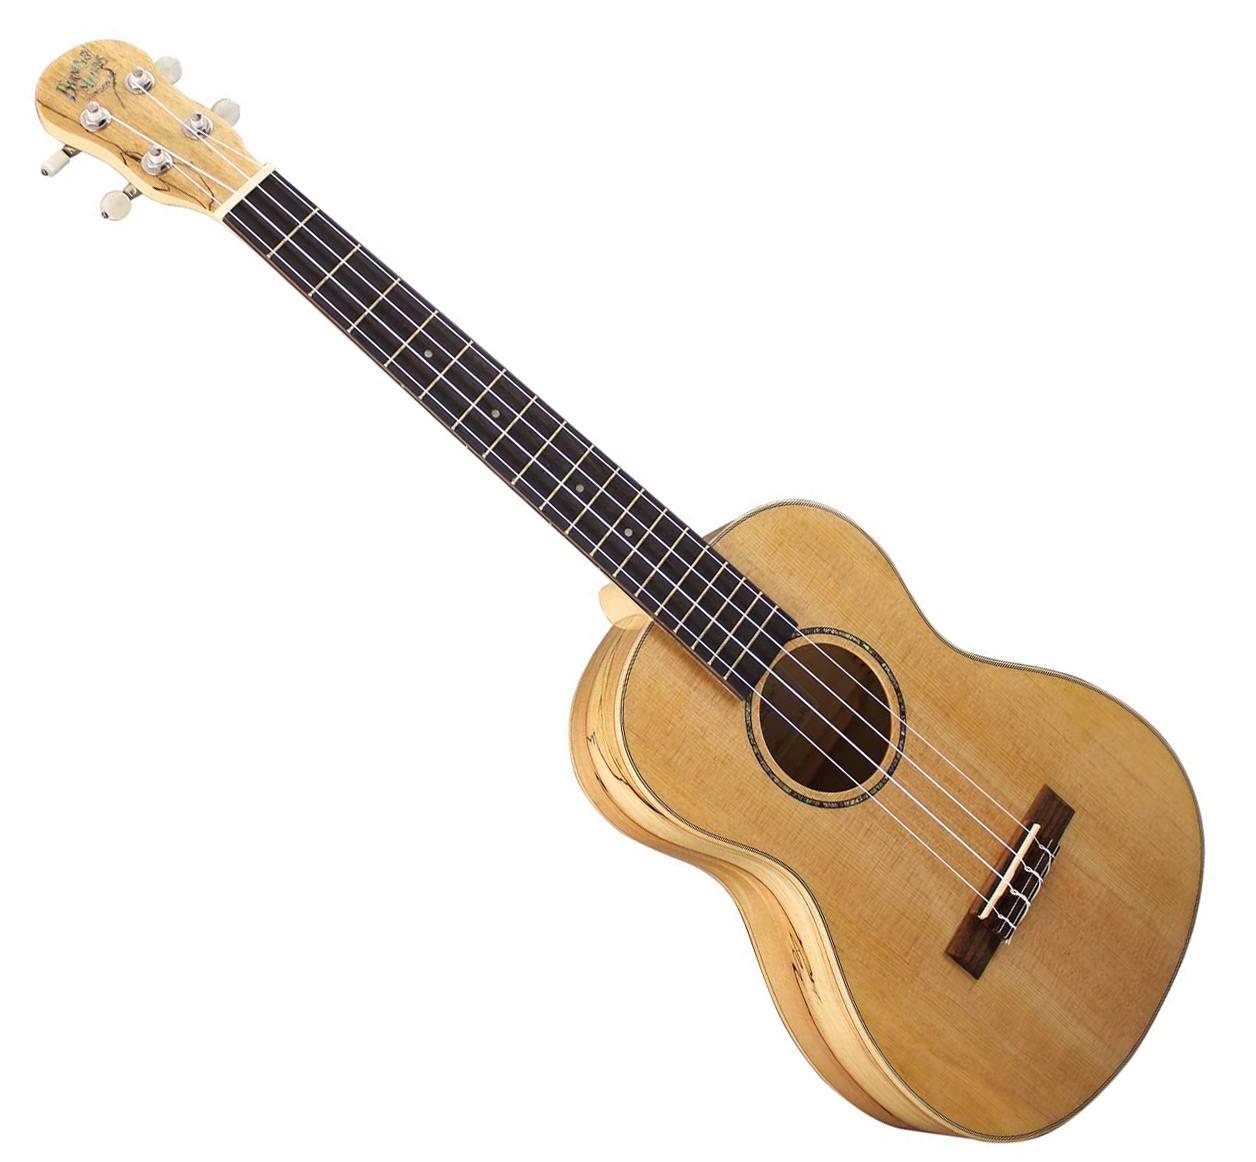 Barnes & Mullins Gresse concert ukulele - Clarke's Music